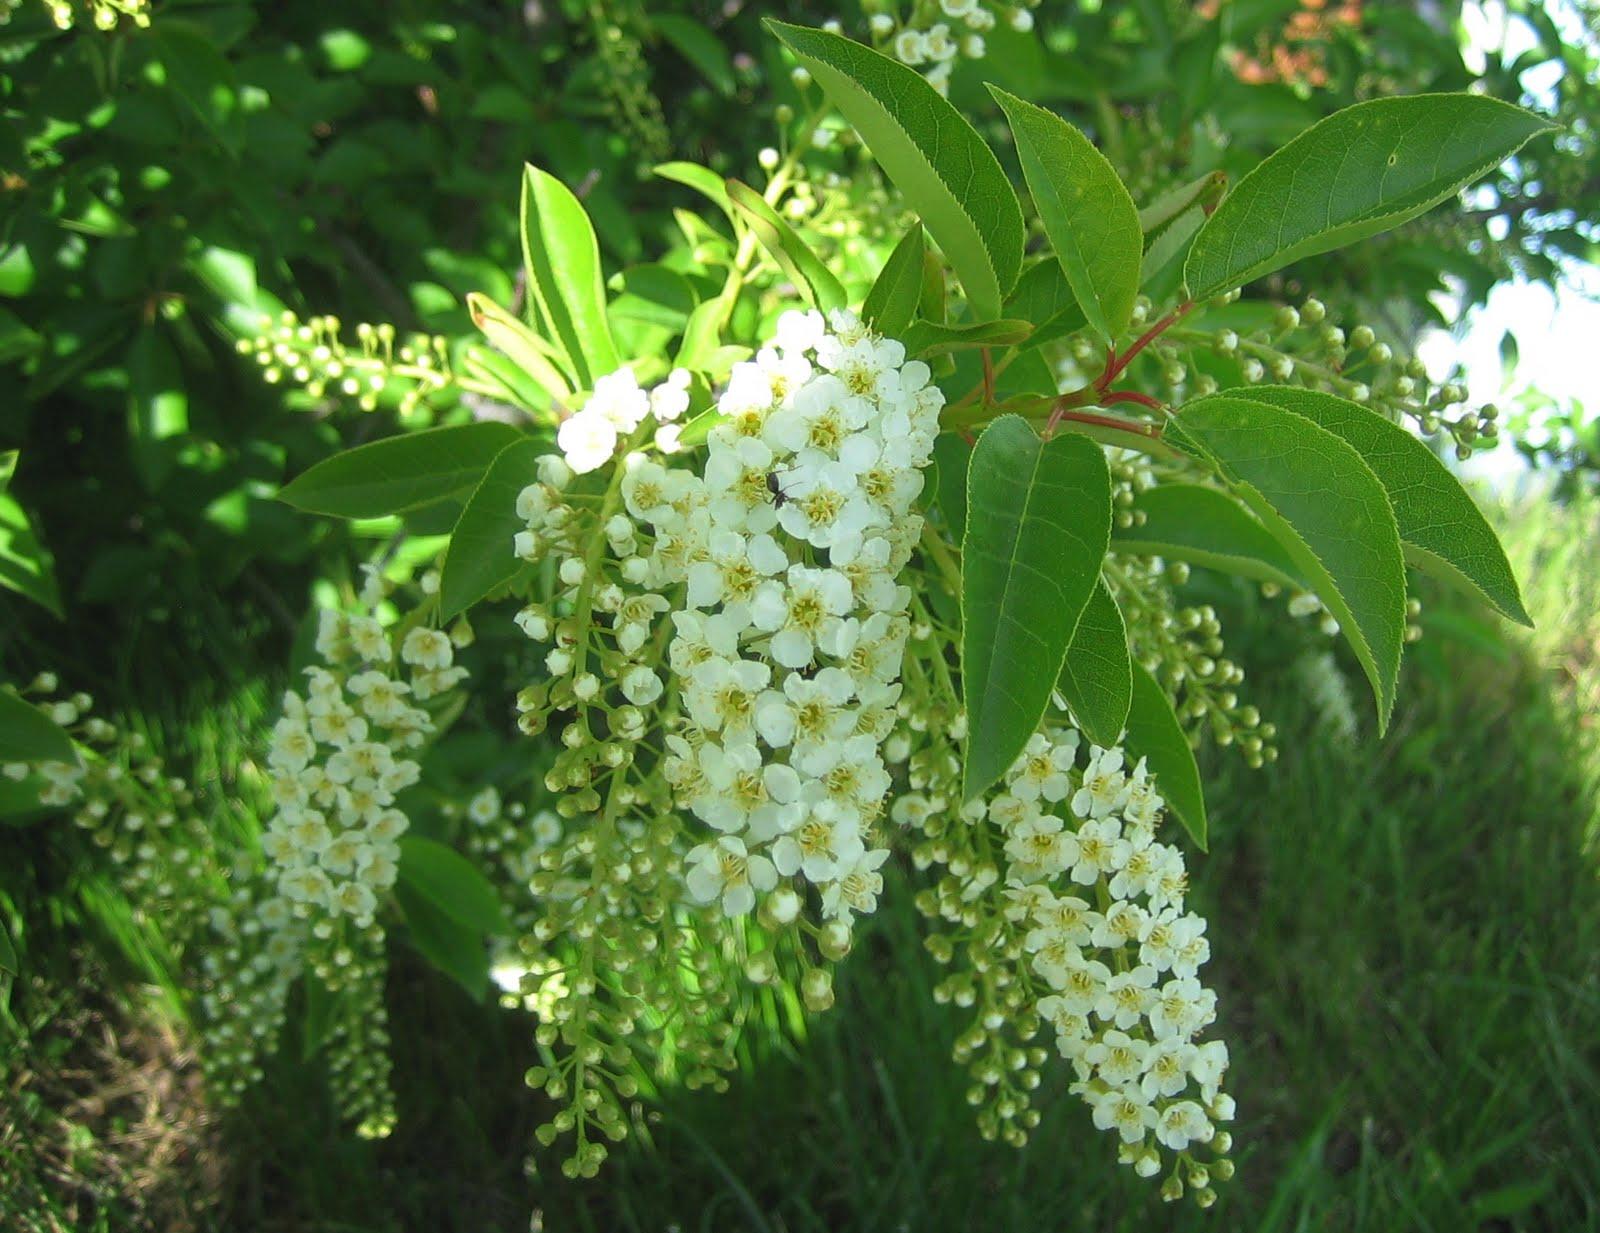 http://3.bp.blogspot.com/_t4MIXLdITZw/TCkEb0TMRtI/AAAAAAAAGzw/VmQoGiLmleg/s1600/Chokecherry+Blossoms+Prunus+virginiana.JPG